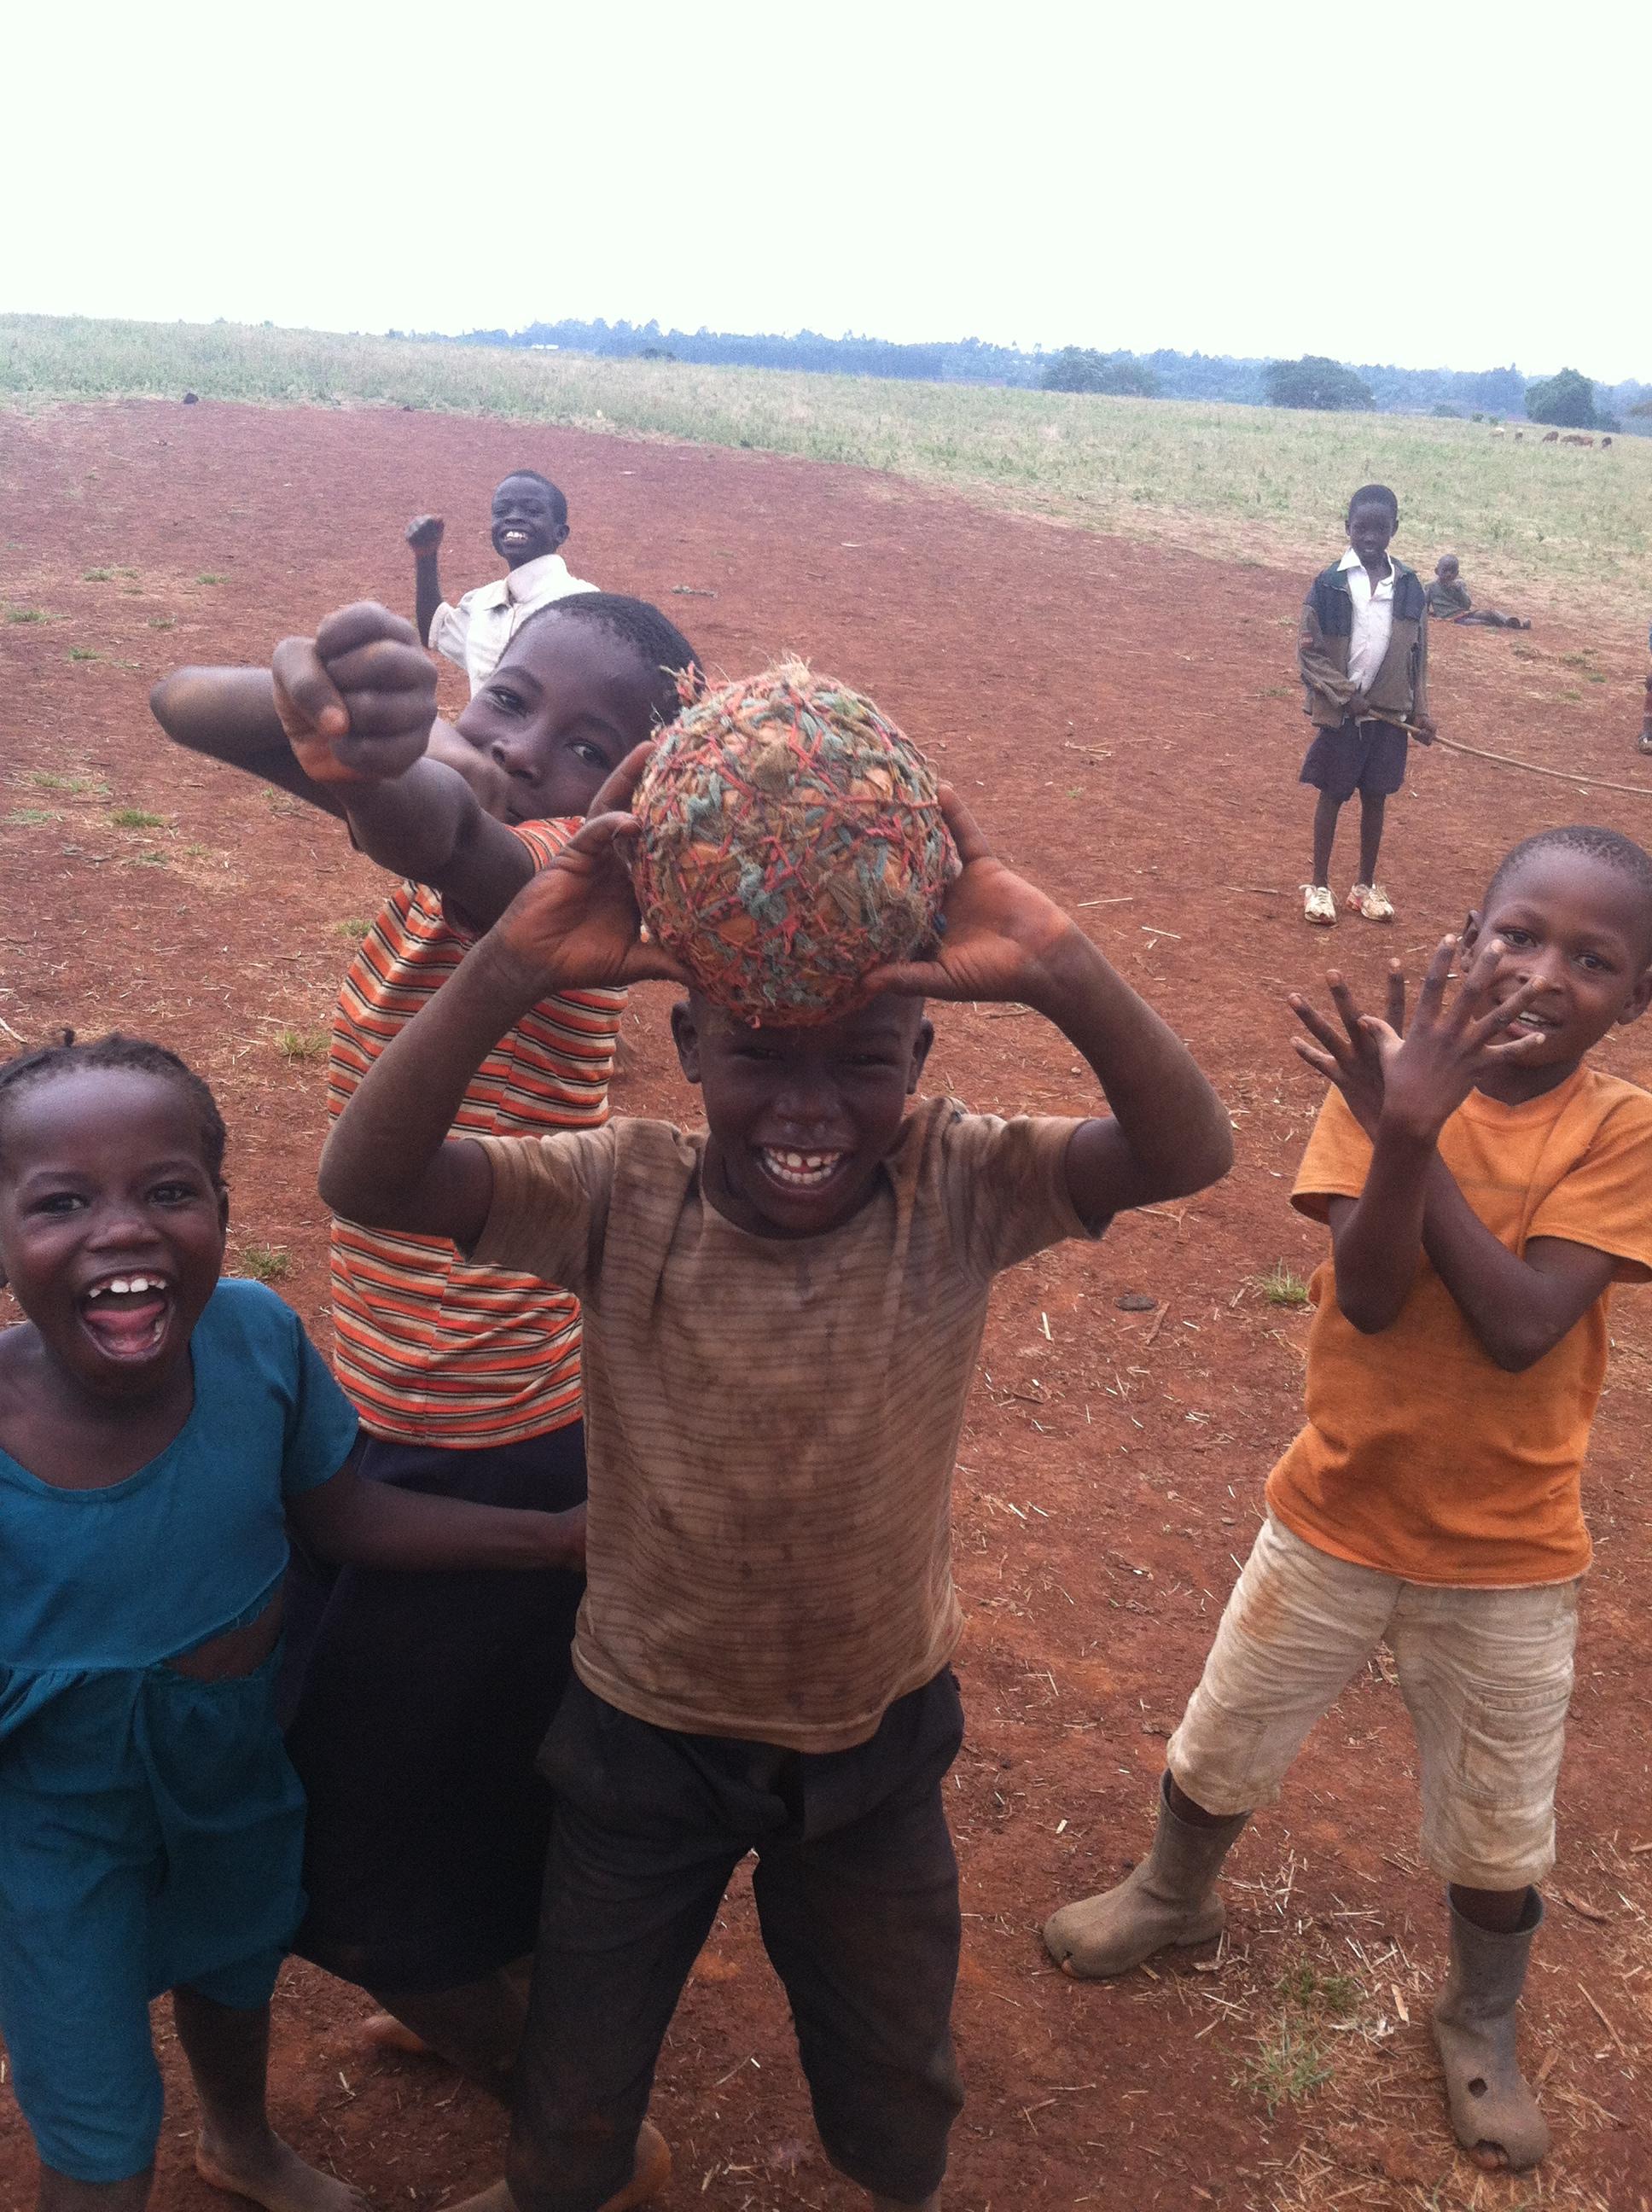 Children For Daz Studio And Poser: Games Kenyan Children Play